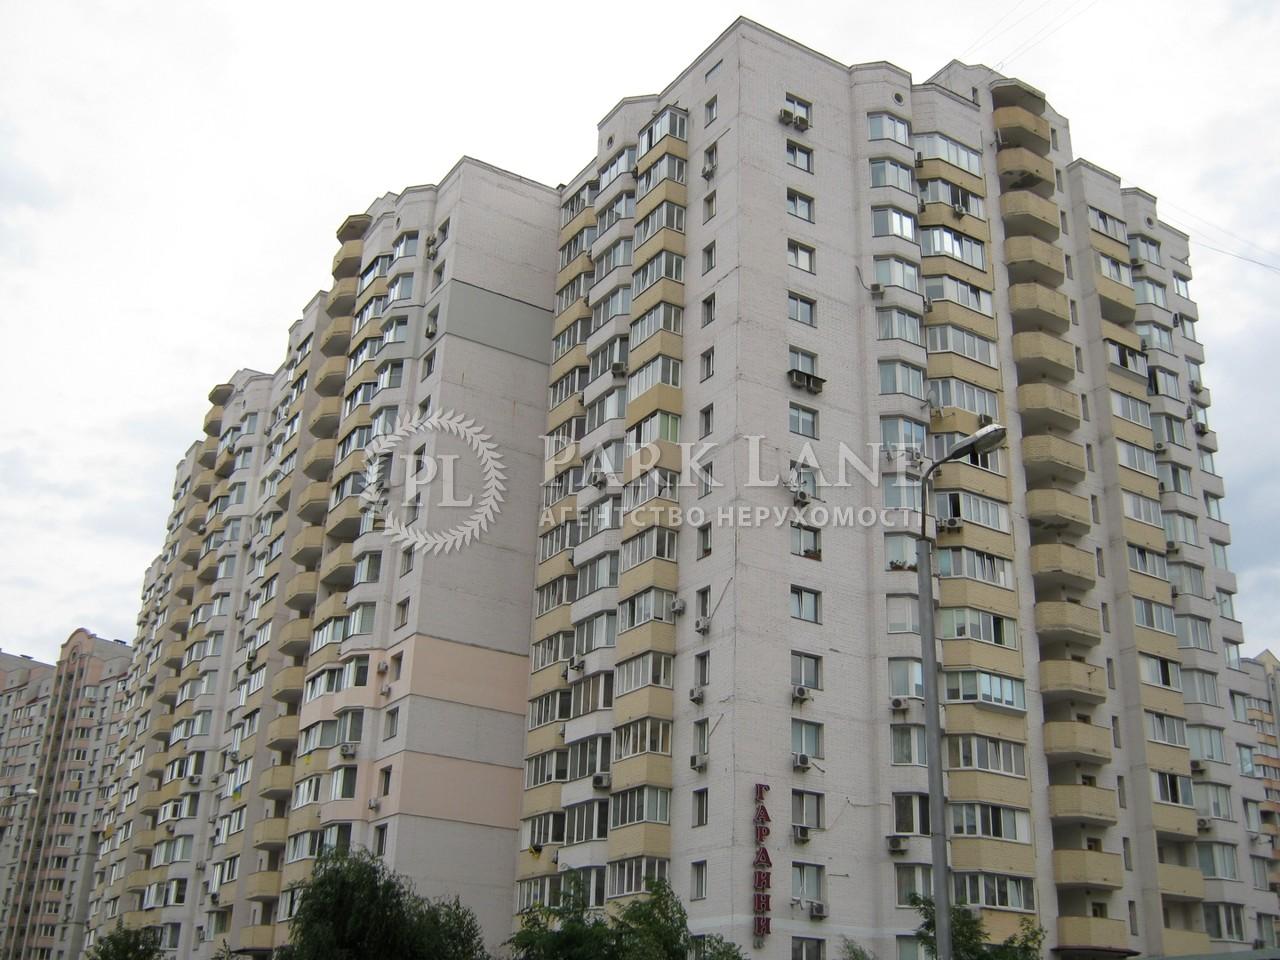 Квартира Z-1151426, Ахматовой, 35, Киев - Фото 1